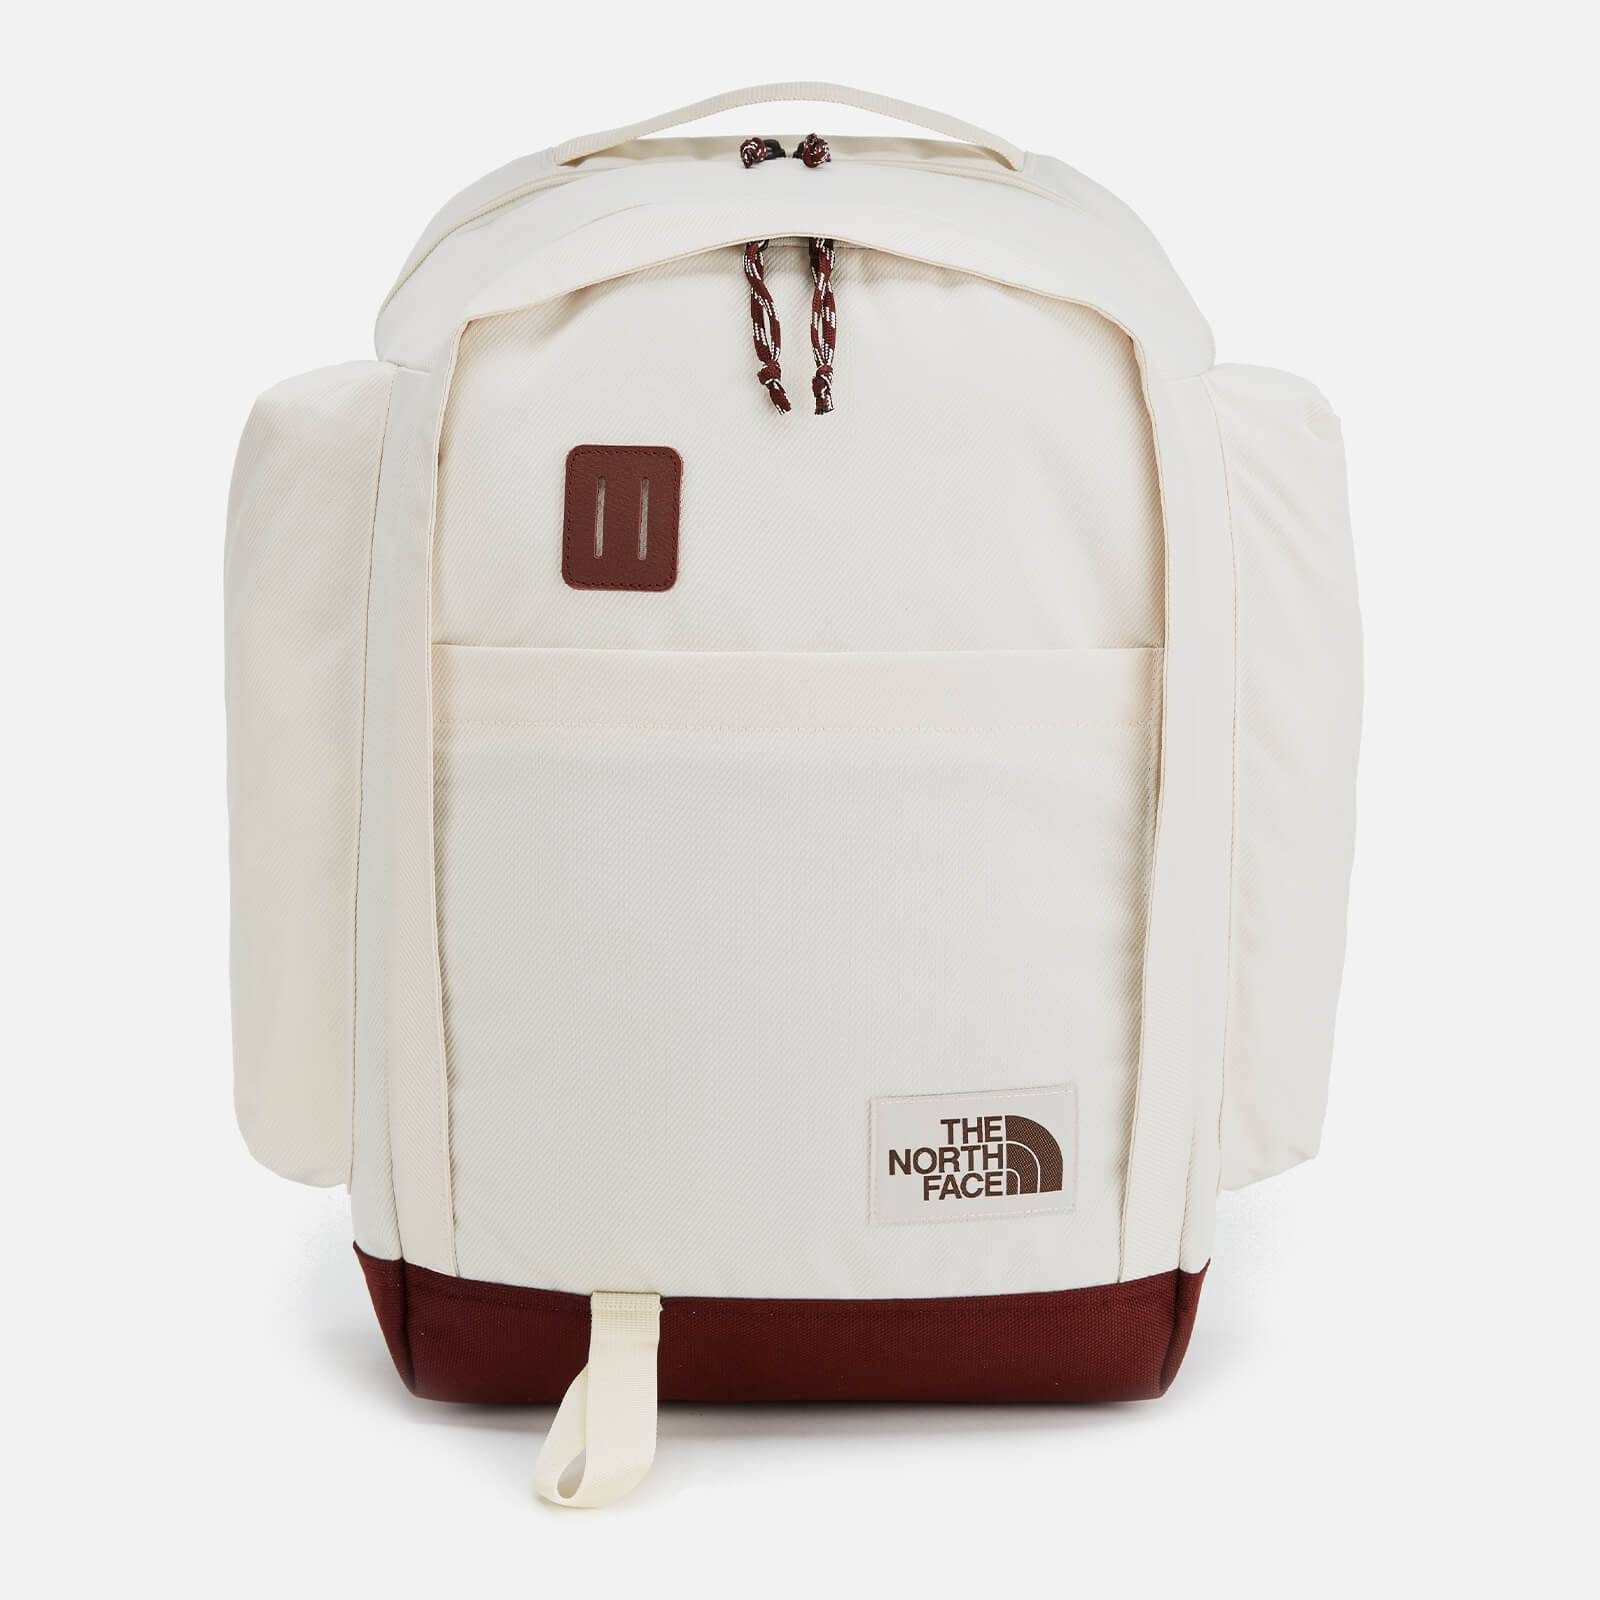 The North Face Men's Ruthsac Bag - Vintage White